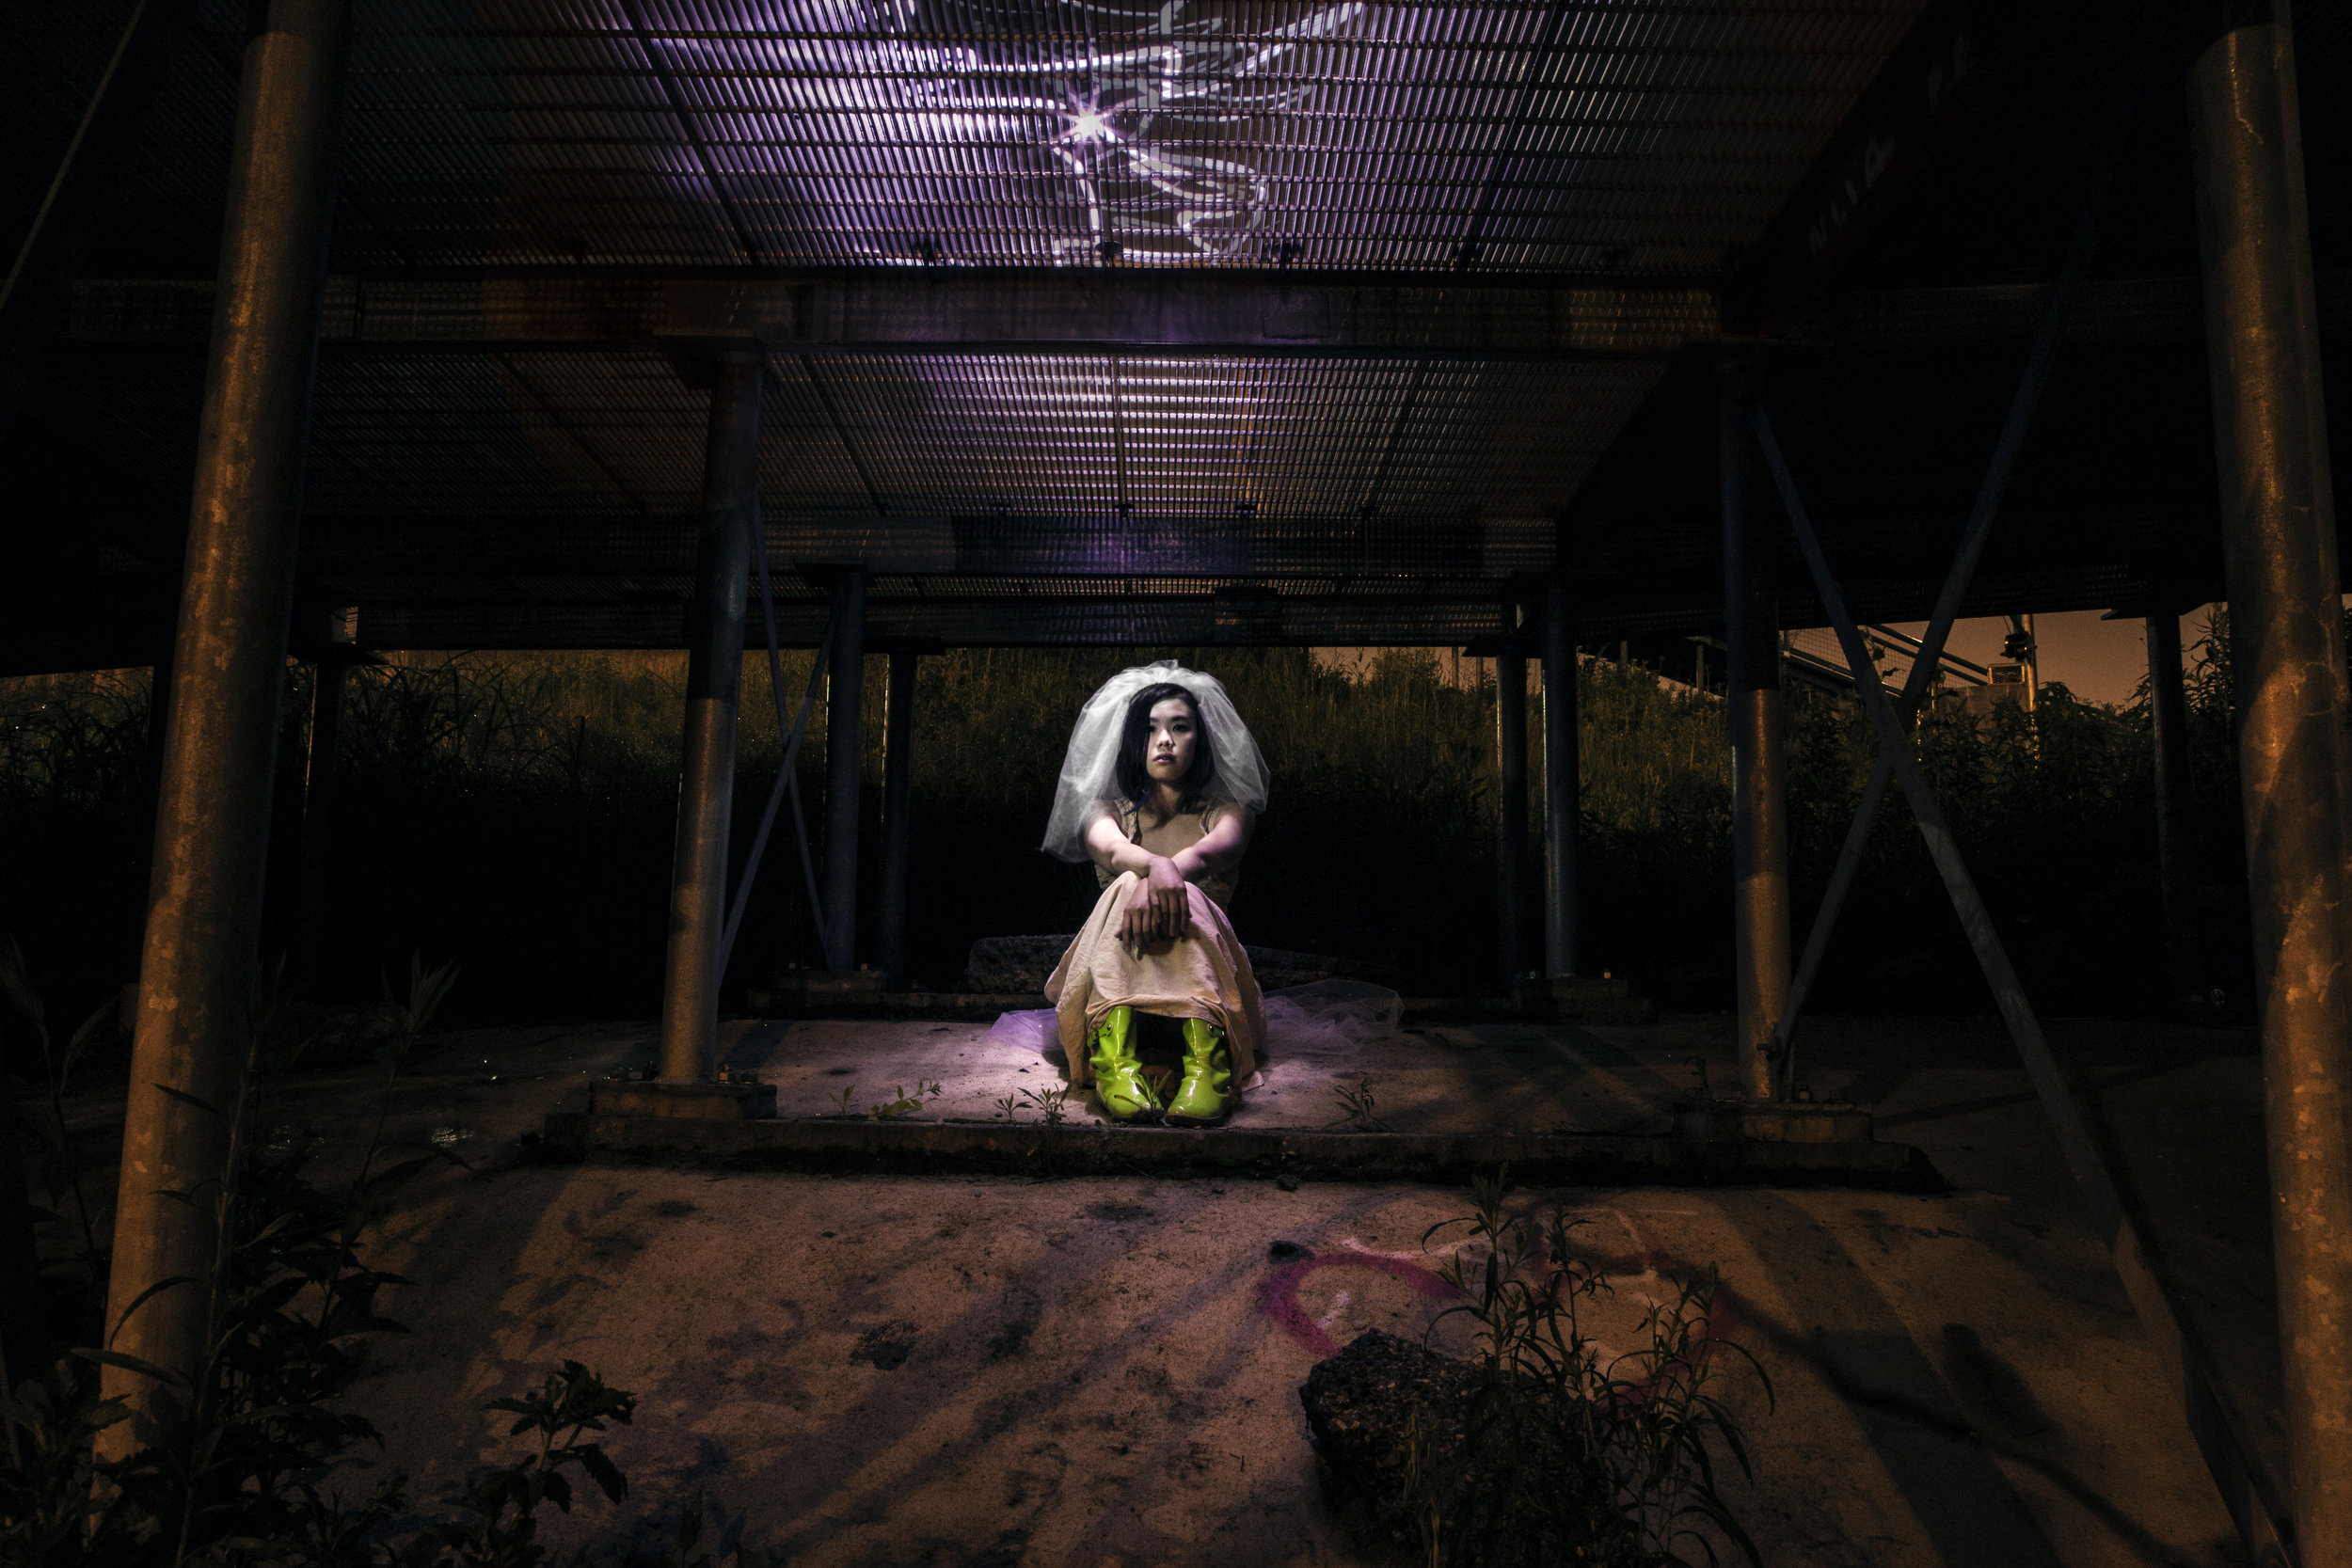 Giau Truong Photography Victoria Ng Model Creative Lights 1.jpg